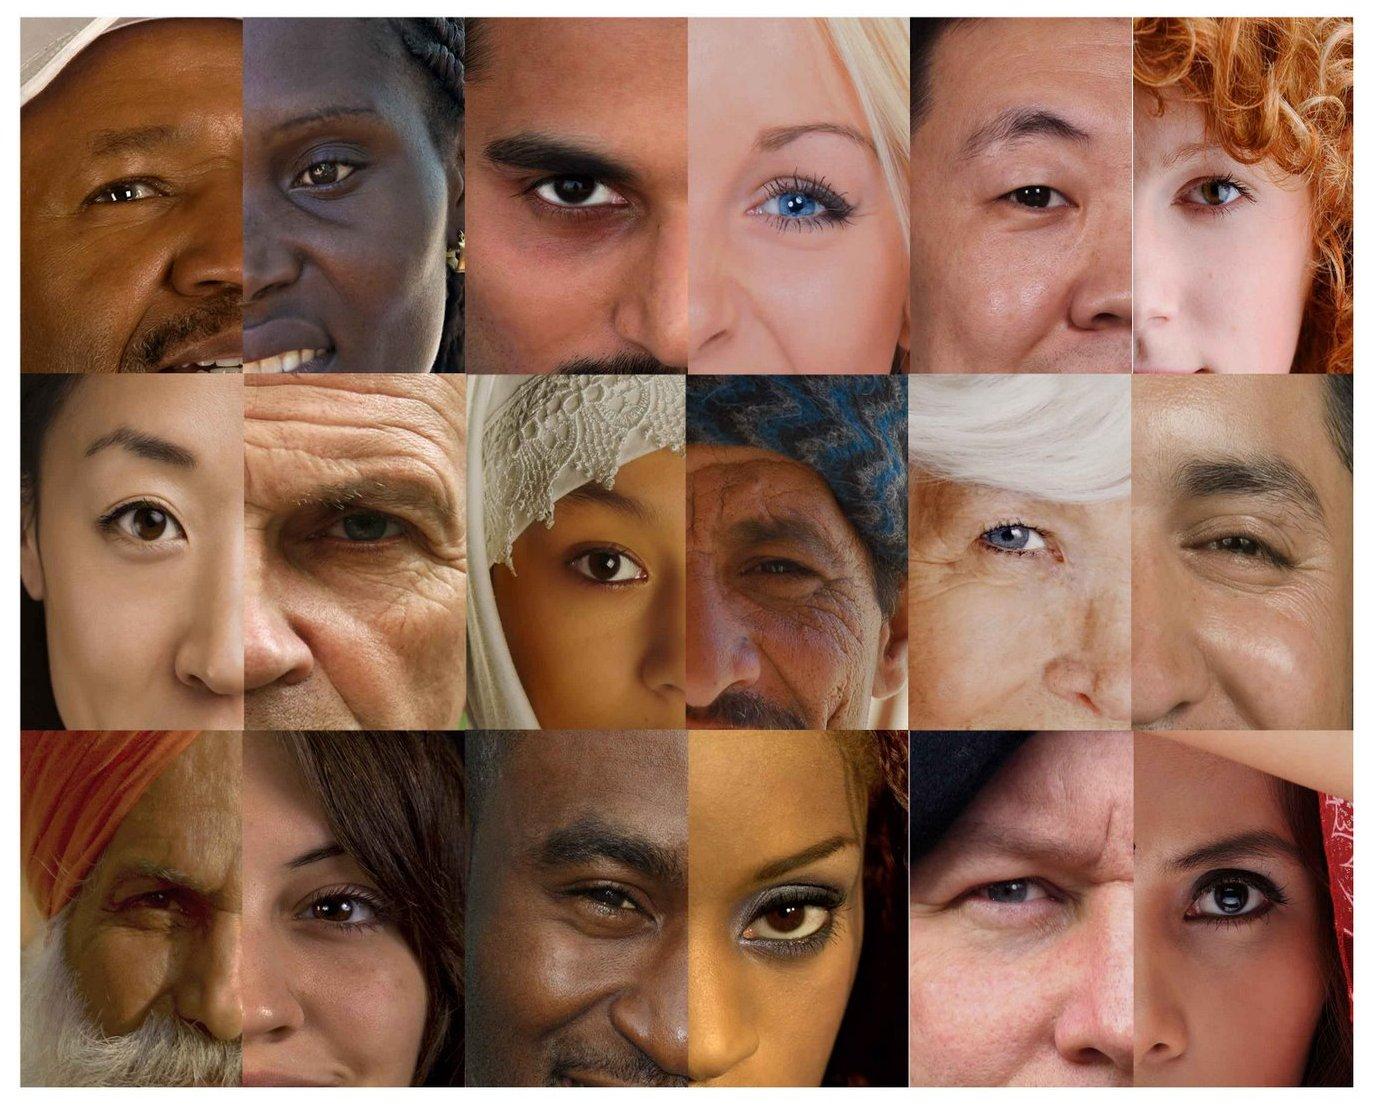 subculture vs multiculturalism